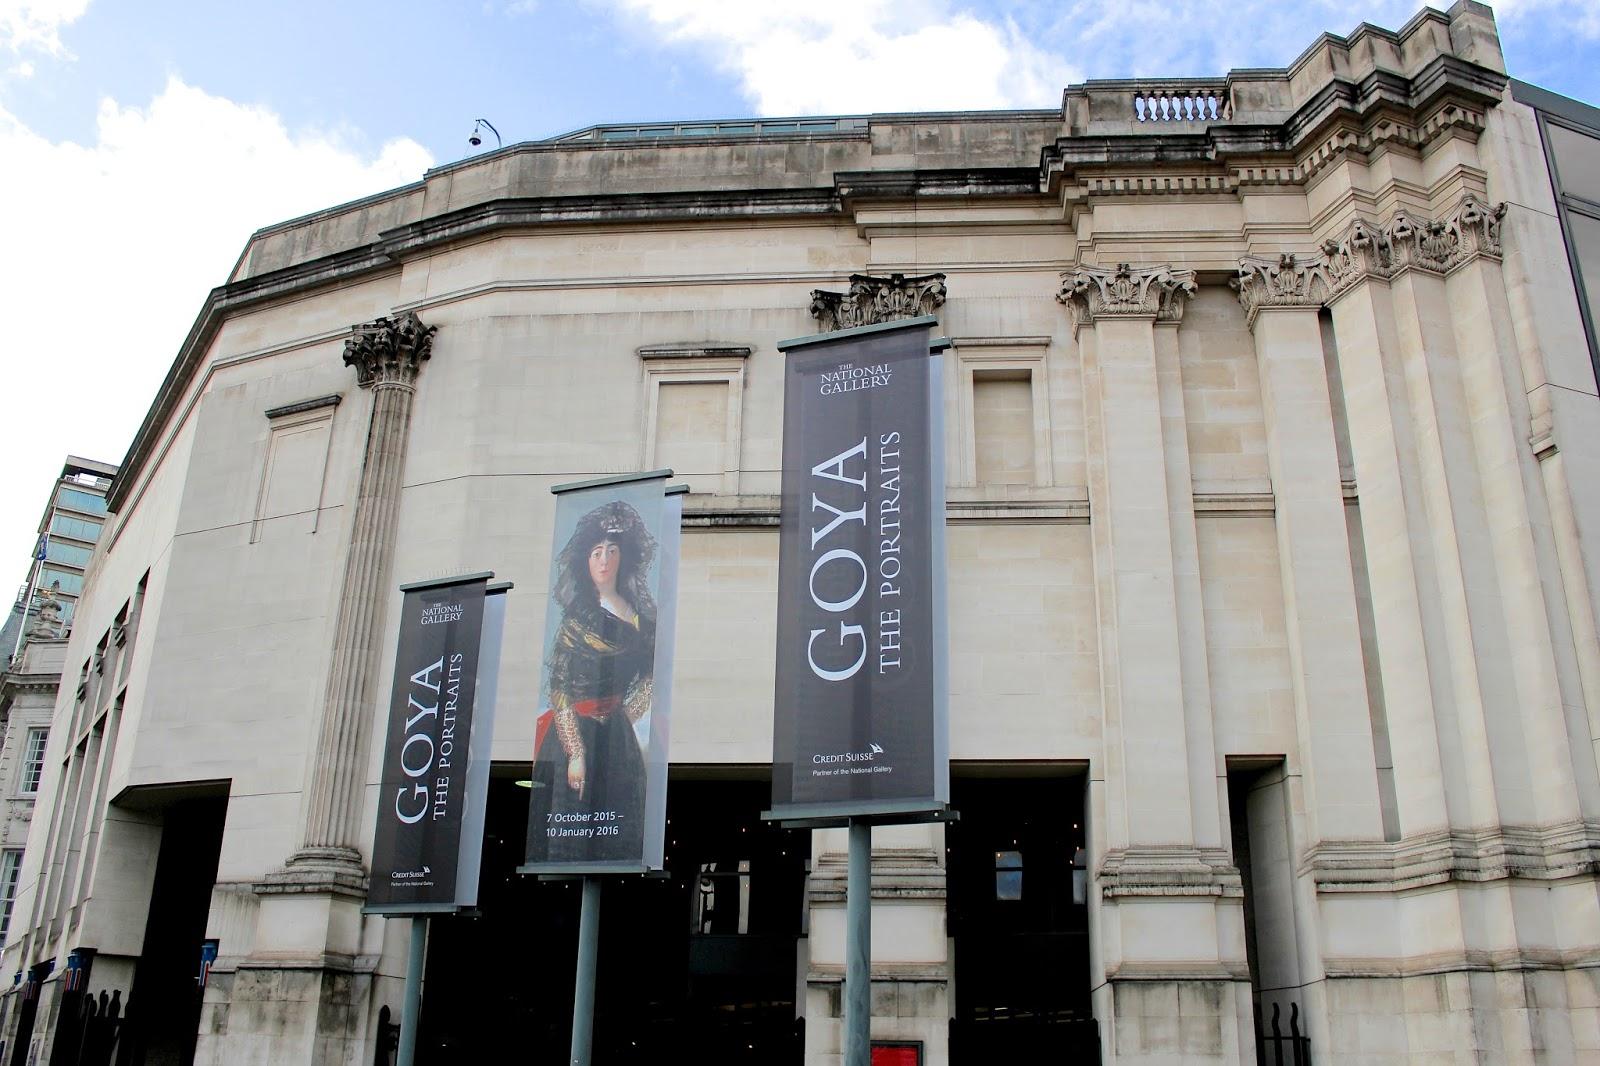 Goya The Portraits National Gallery